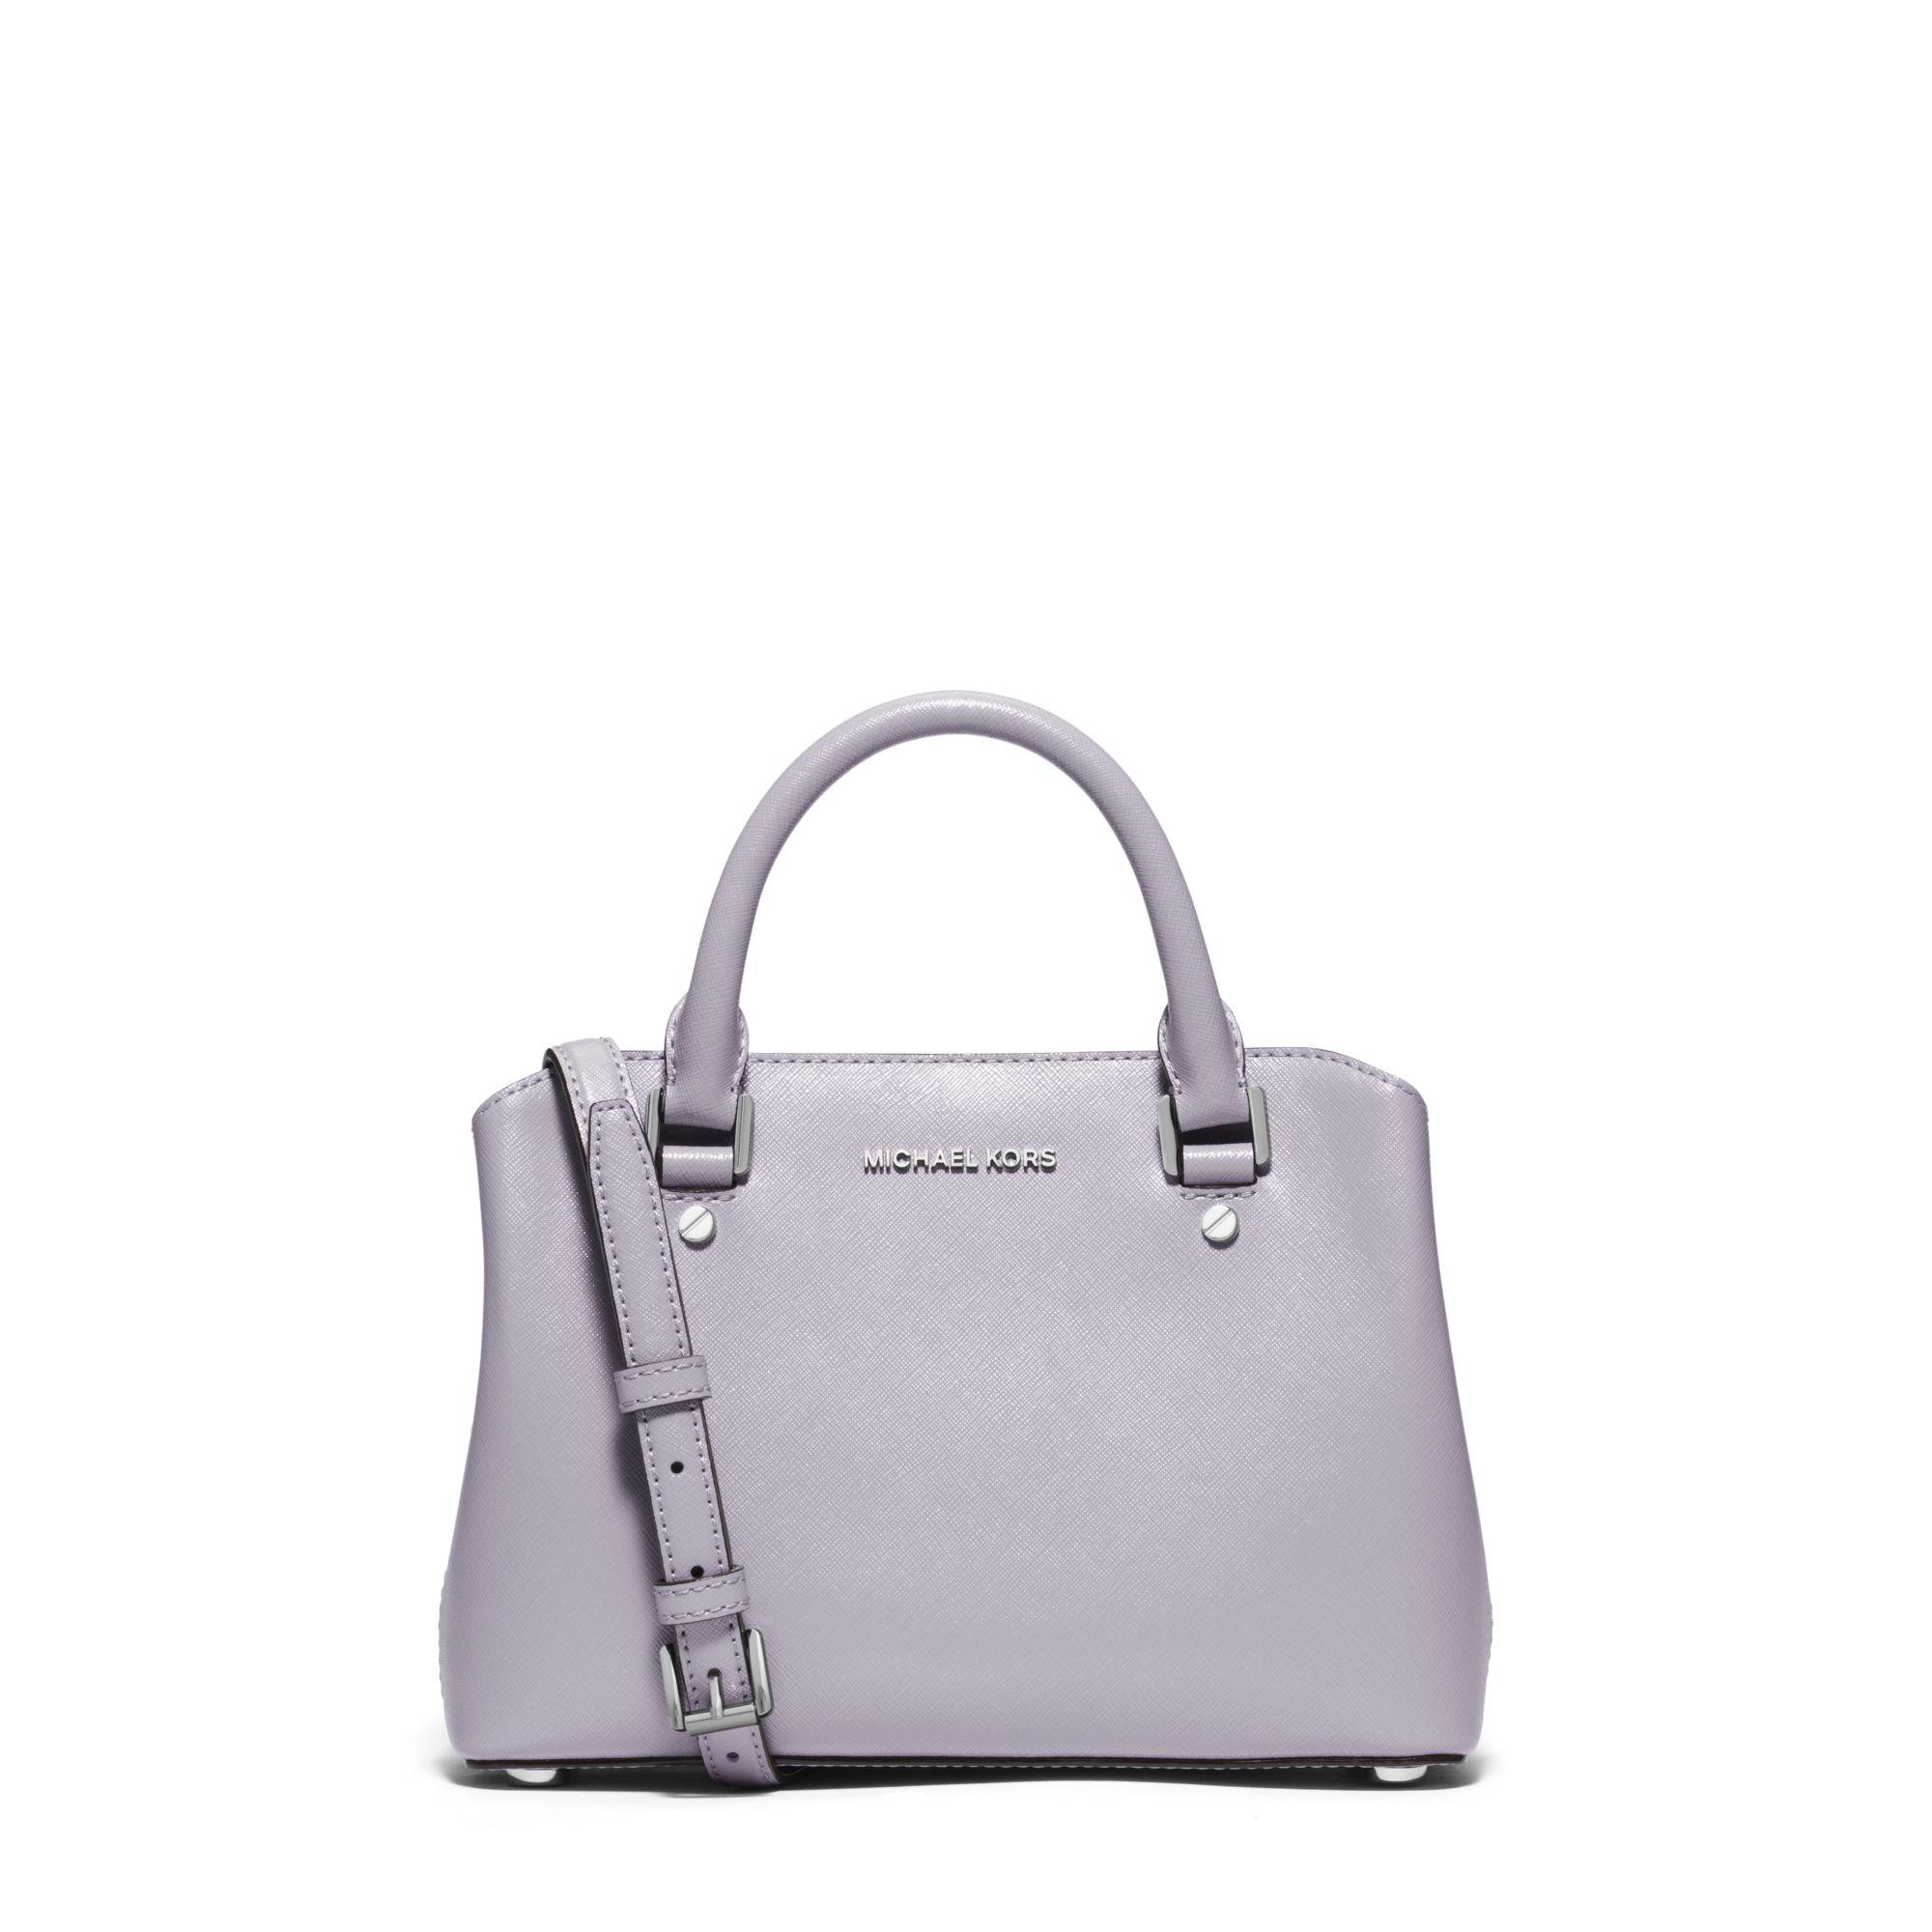 6aa1f944df718f Michael Kors Savannah Small Patent-leather Satchel in Purple - Lyst